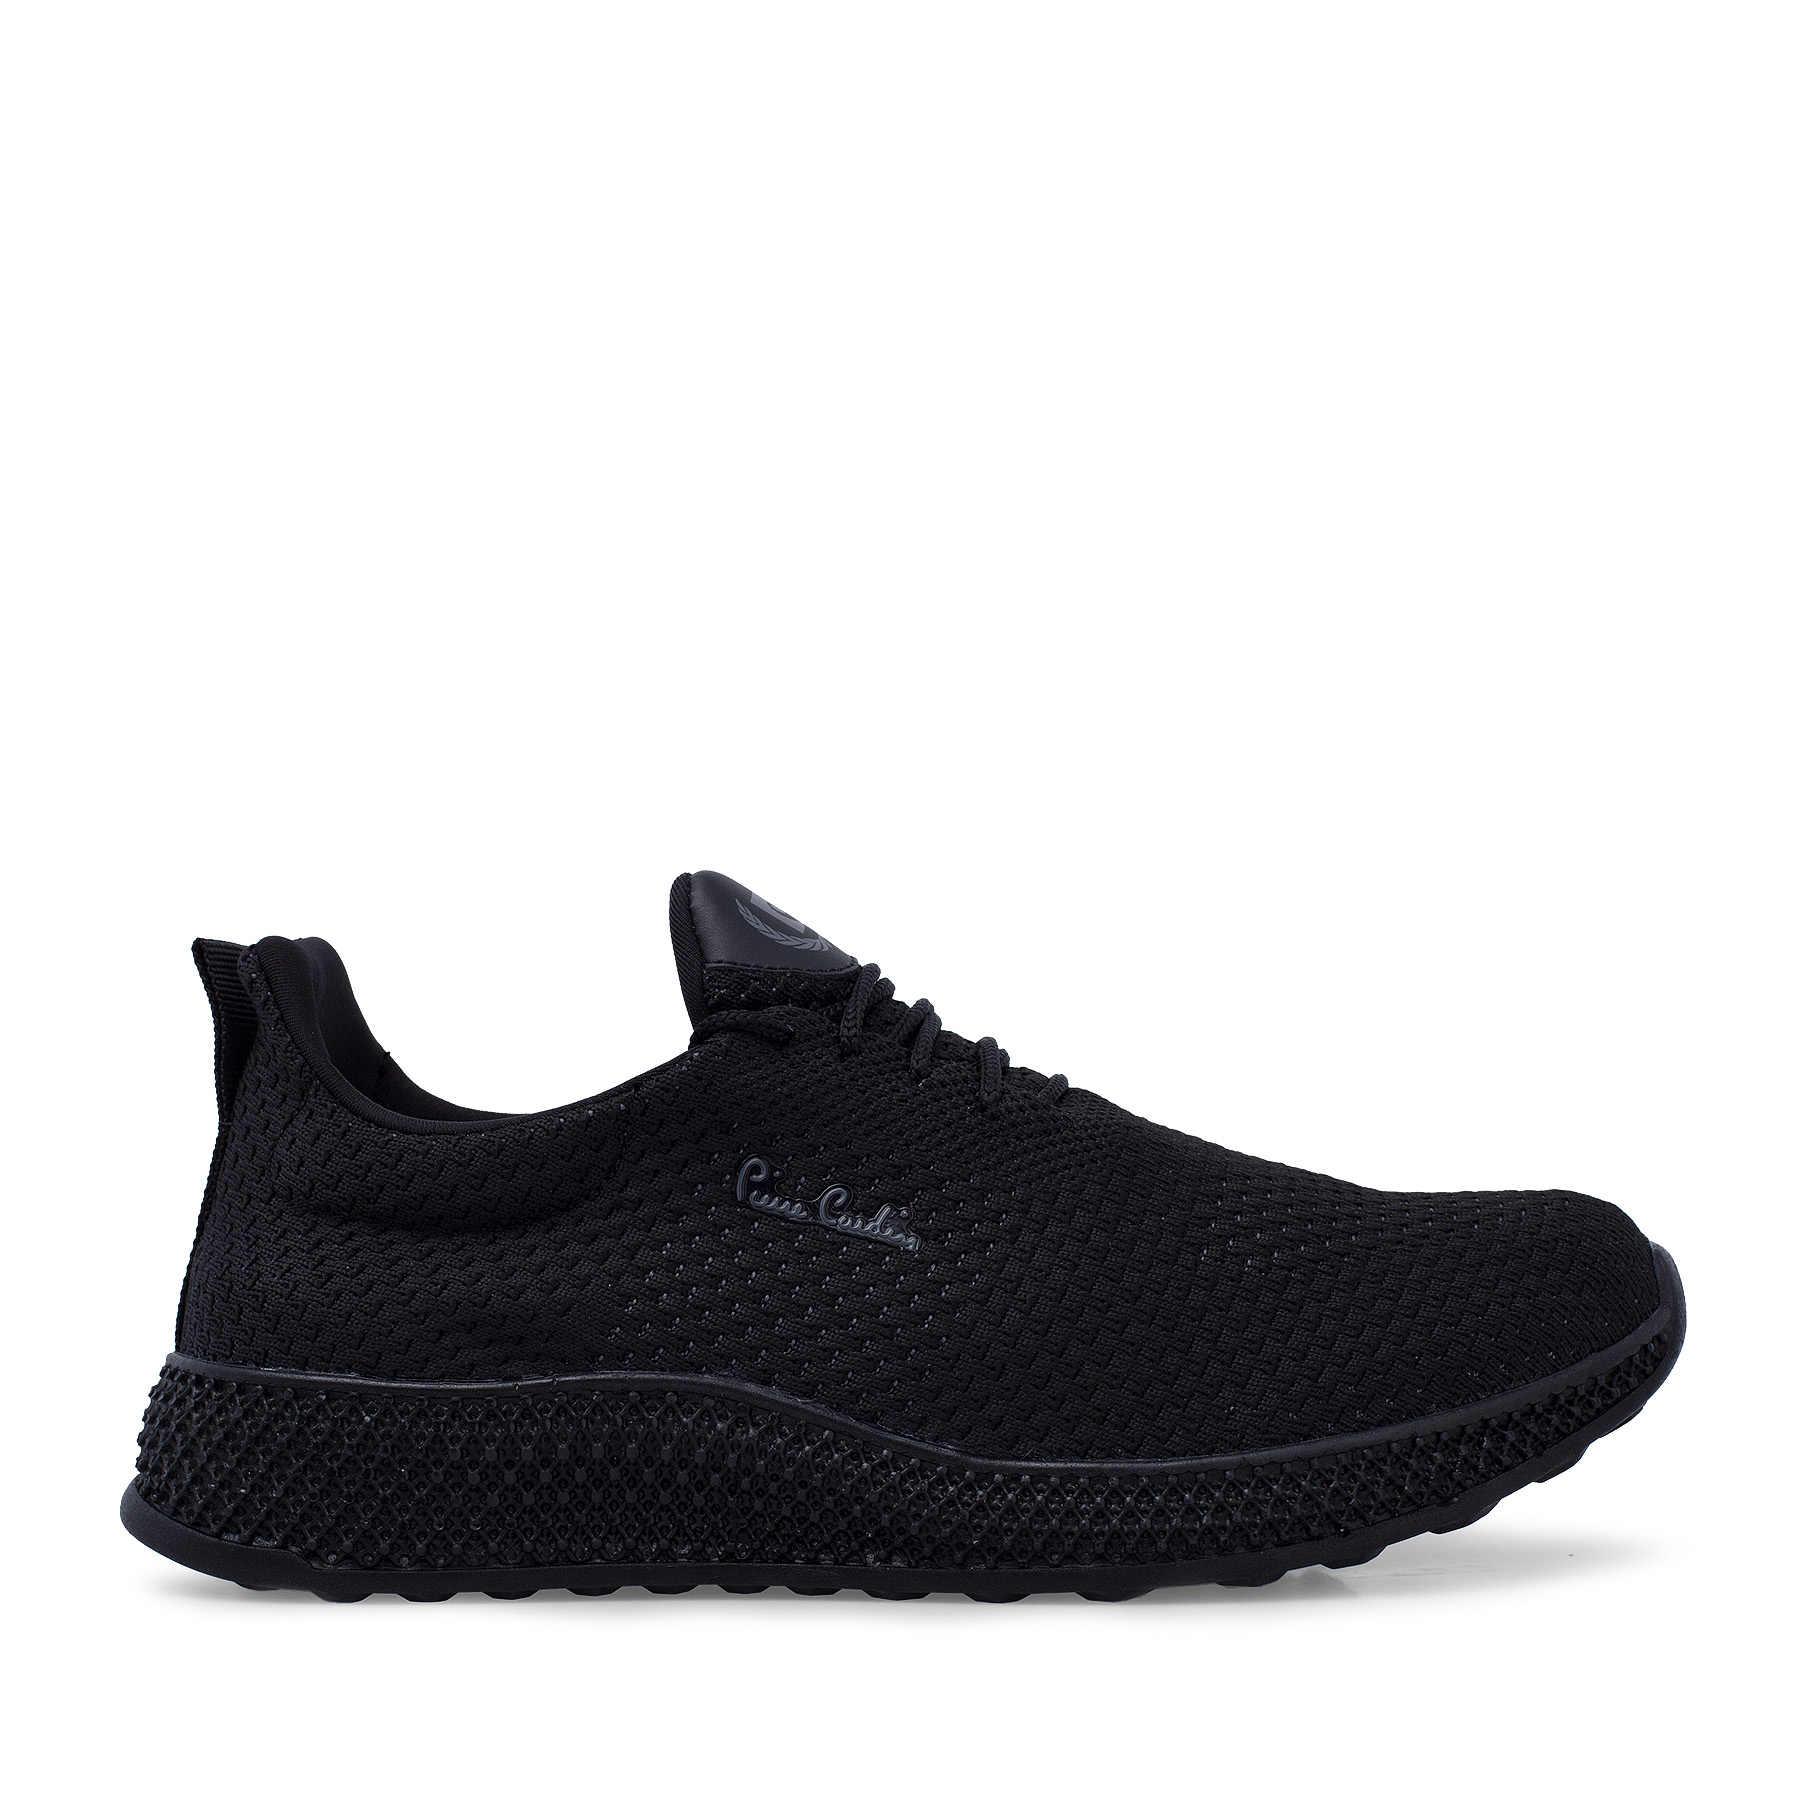 Pierre Cardin Shoes WOMEN SHOES